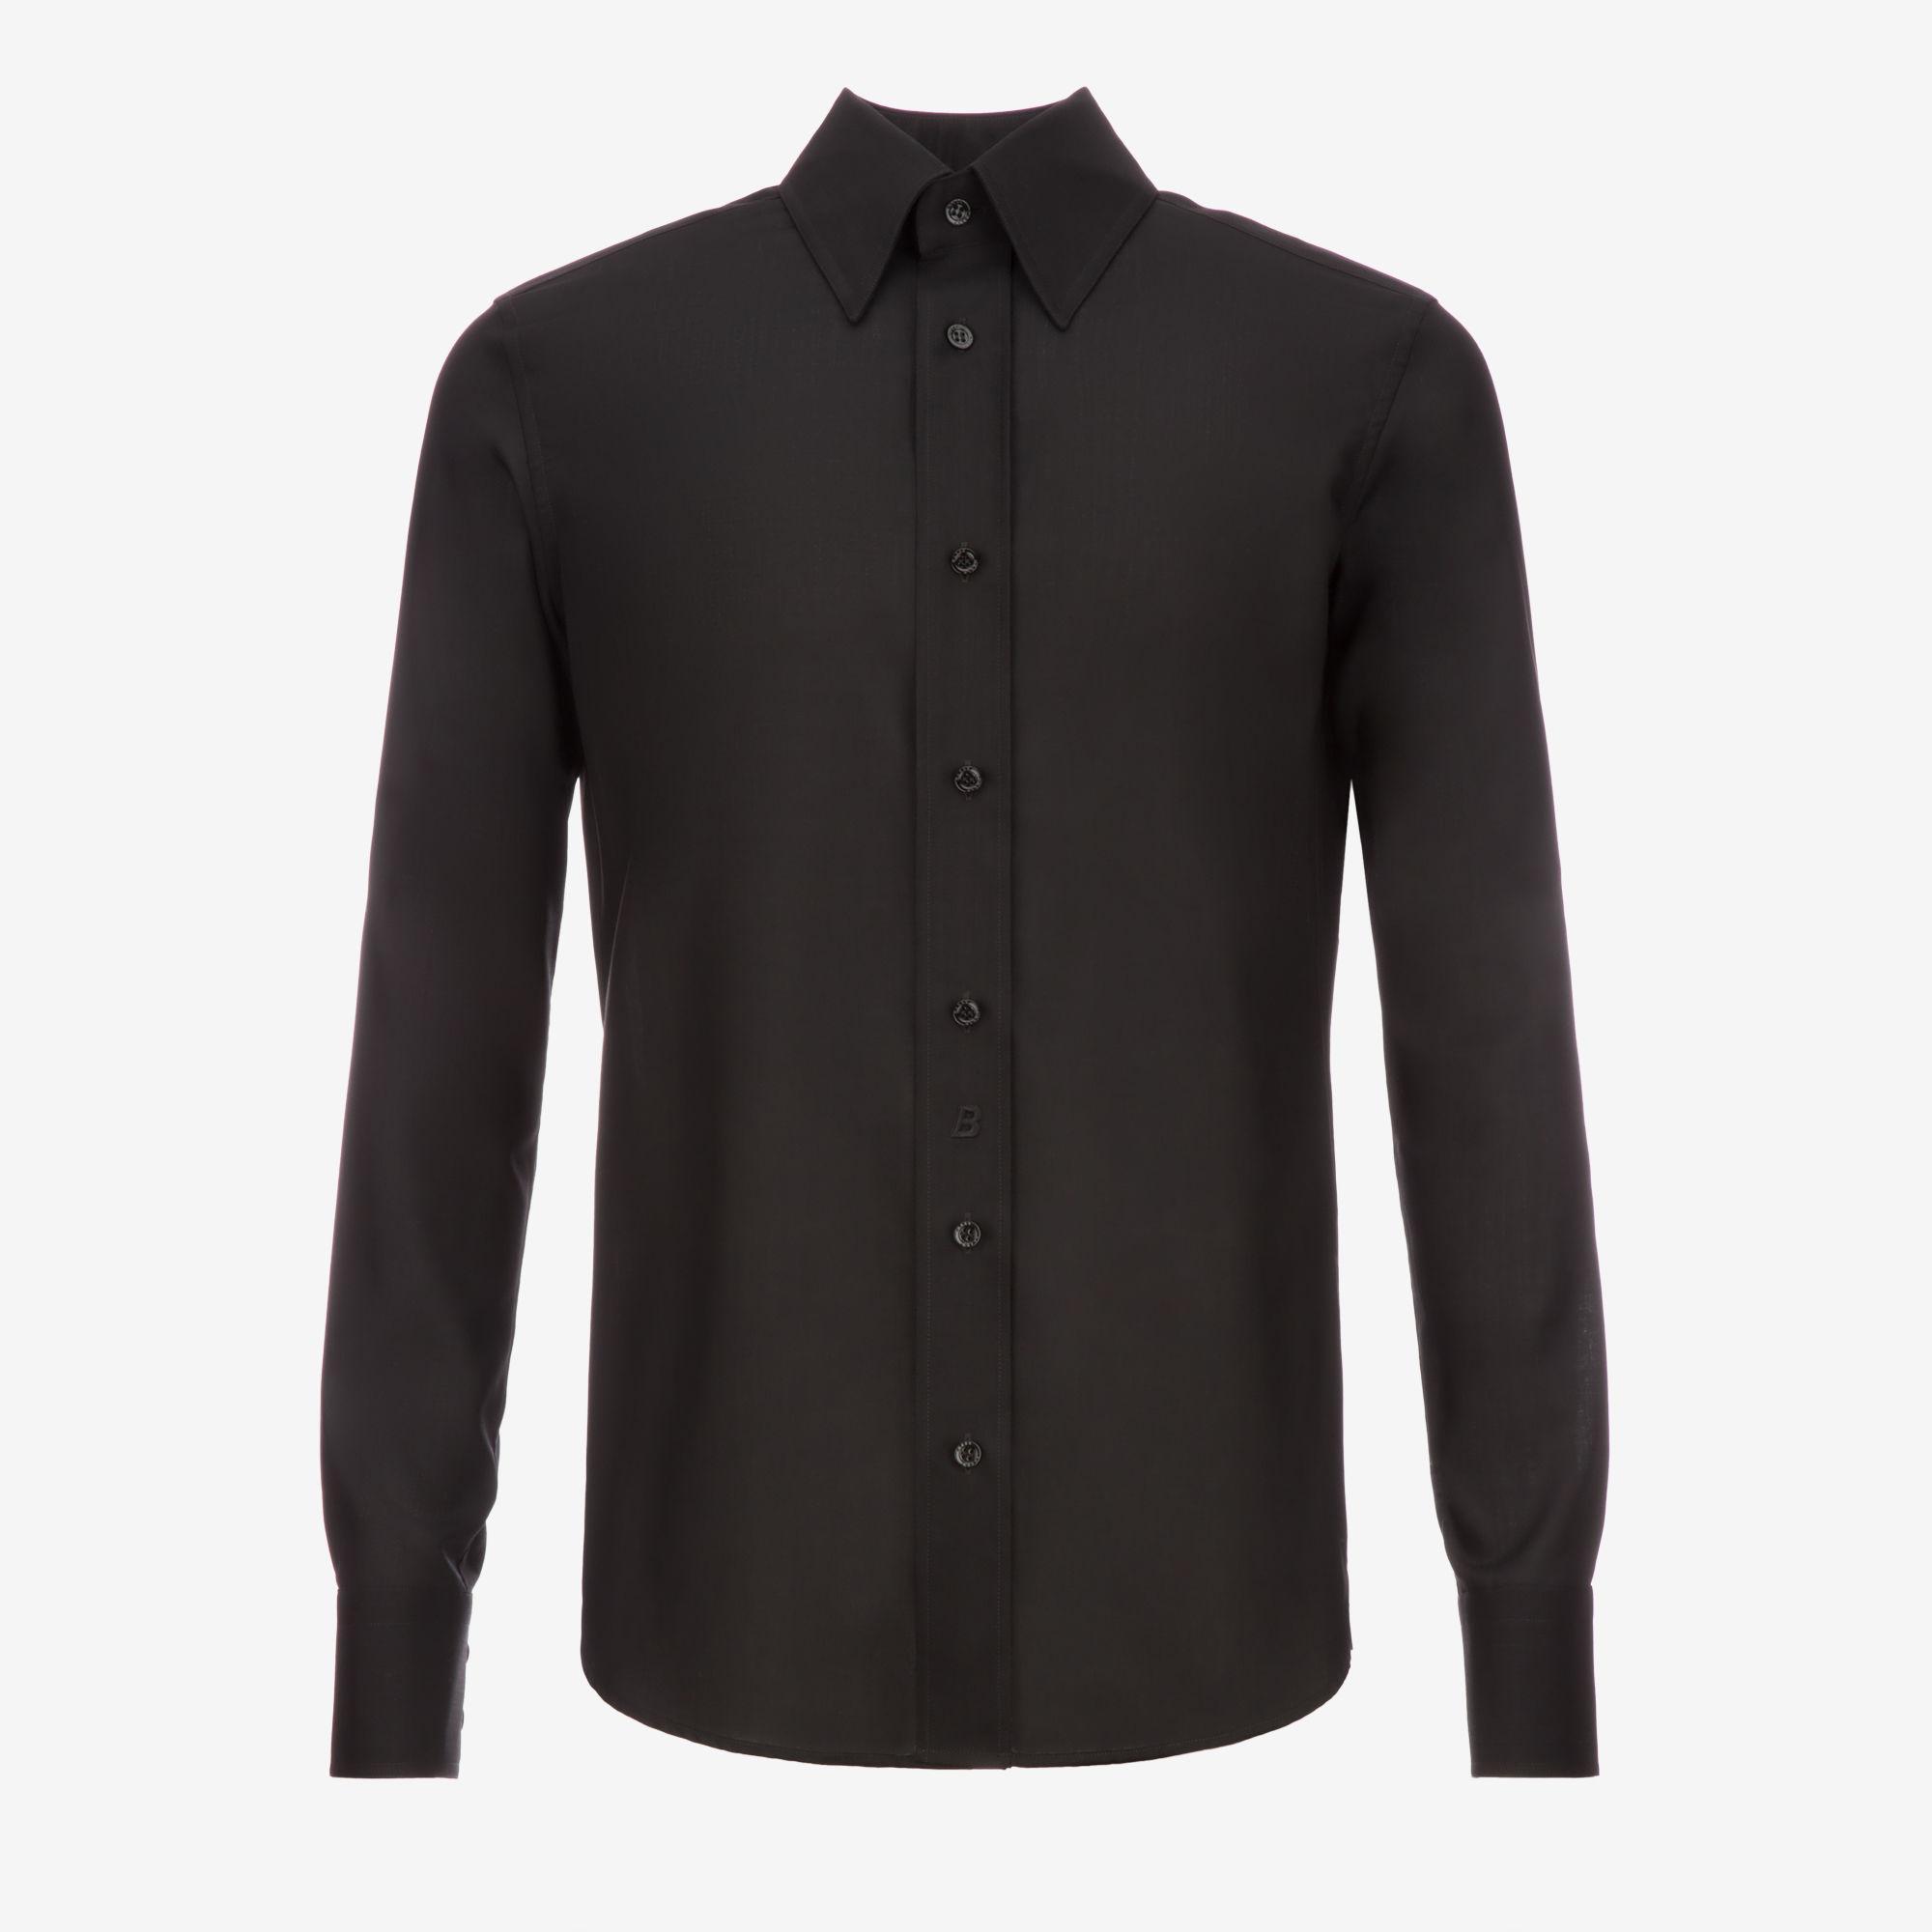 Bally Wool Crepe Shirt In Black For Men Lyst